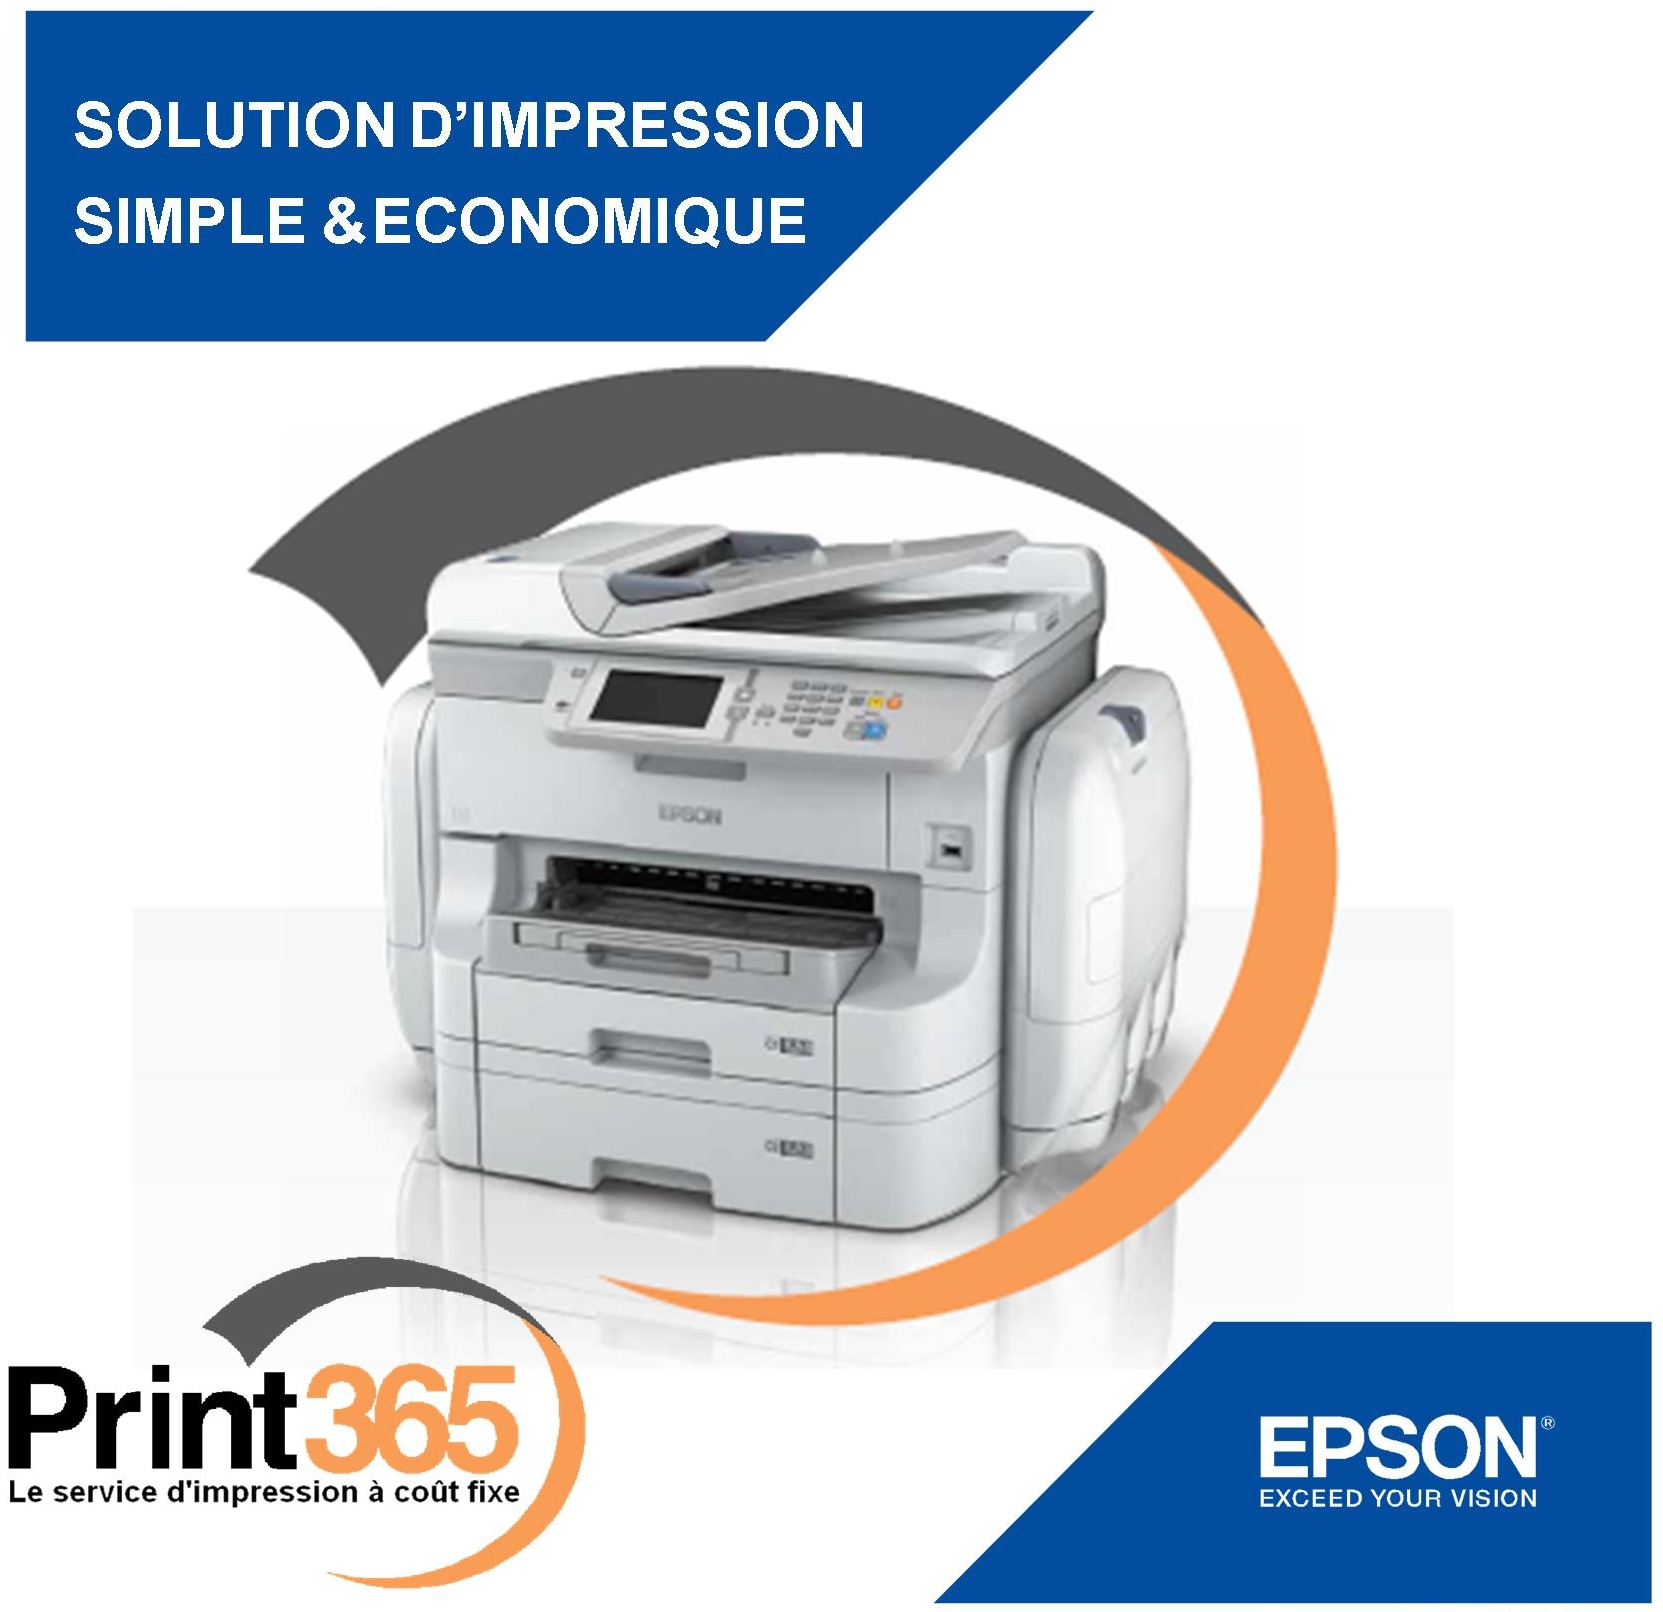 EPSON Print 365